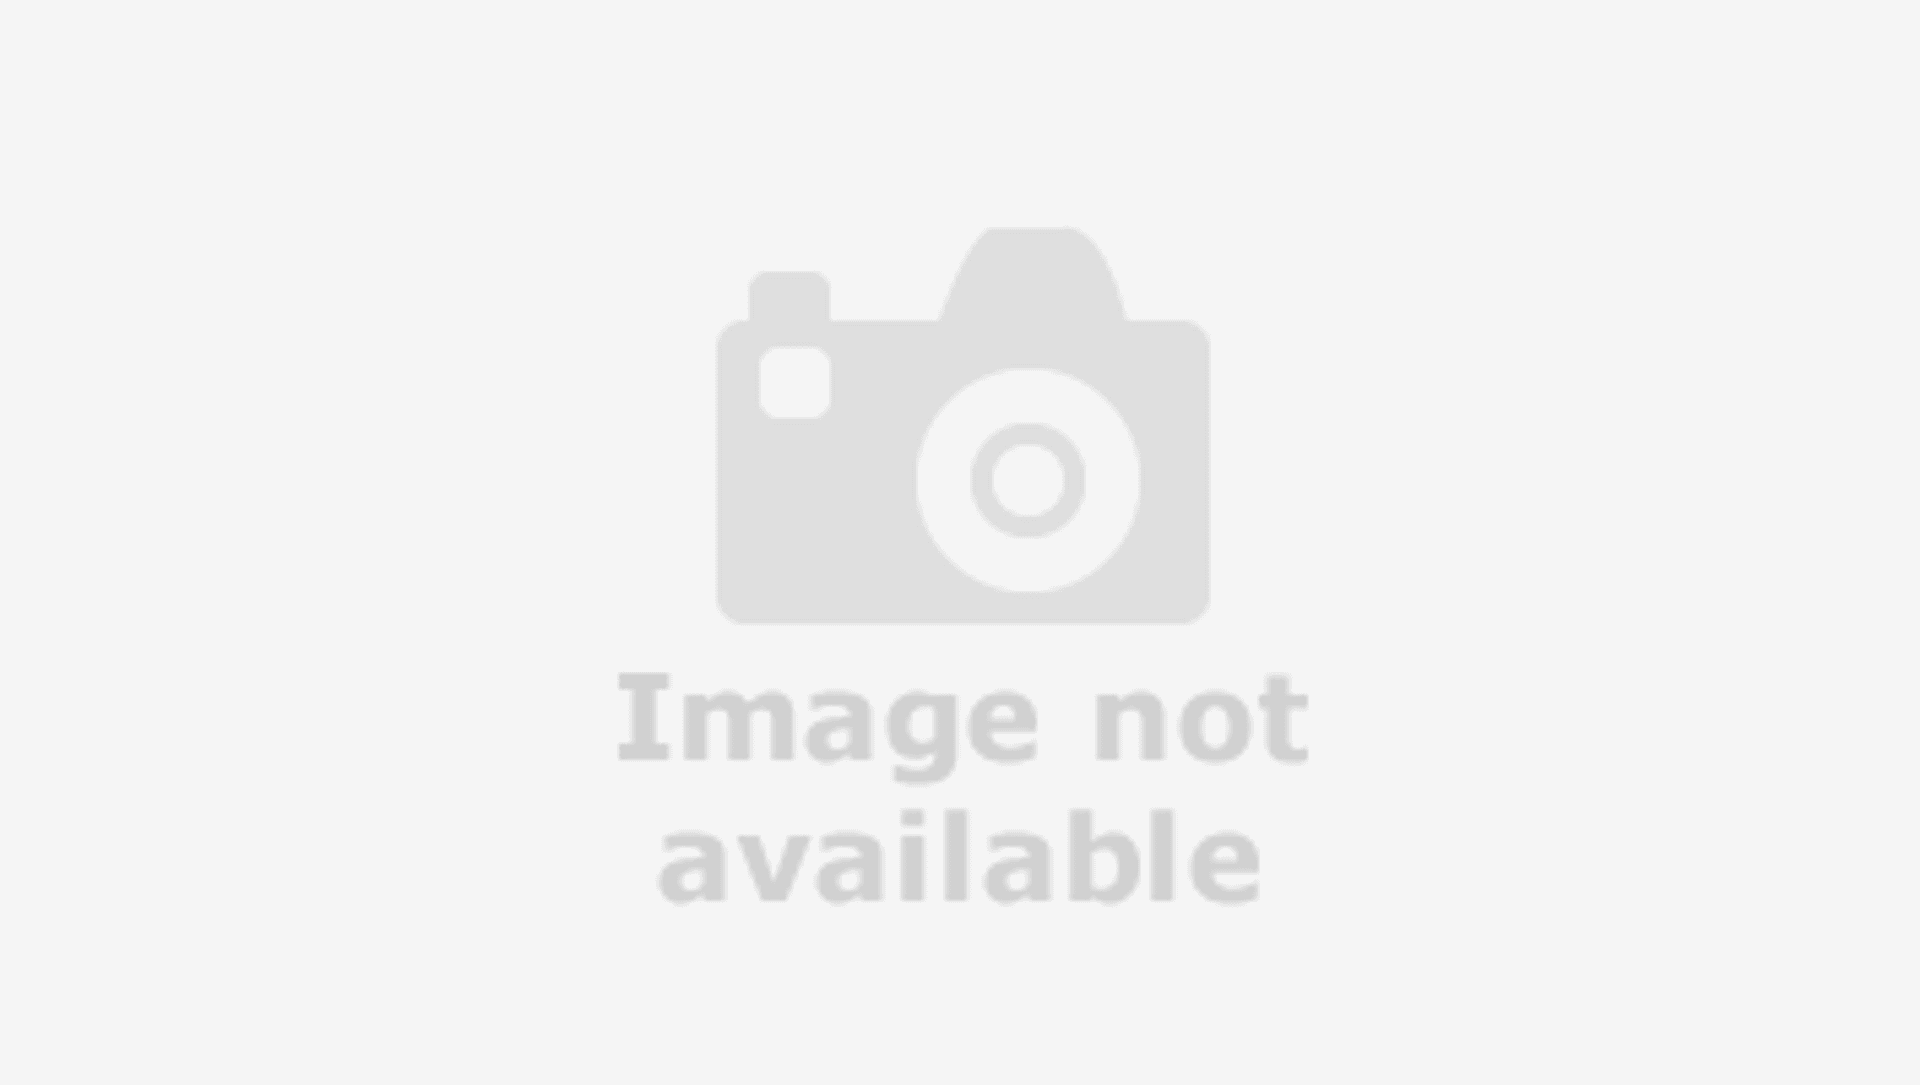 Vauxhall Grandland X  image